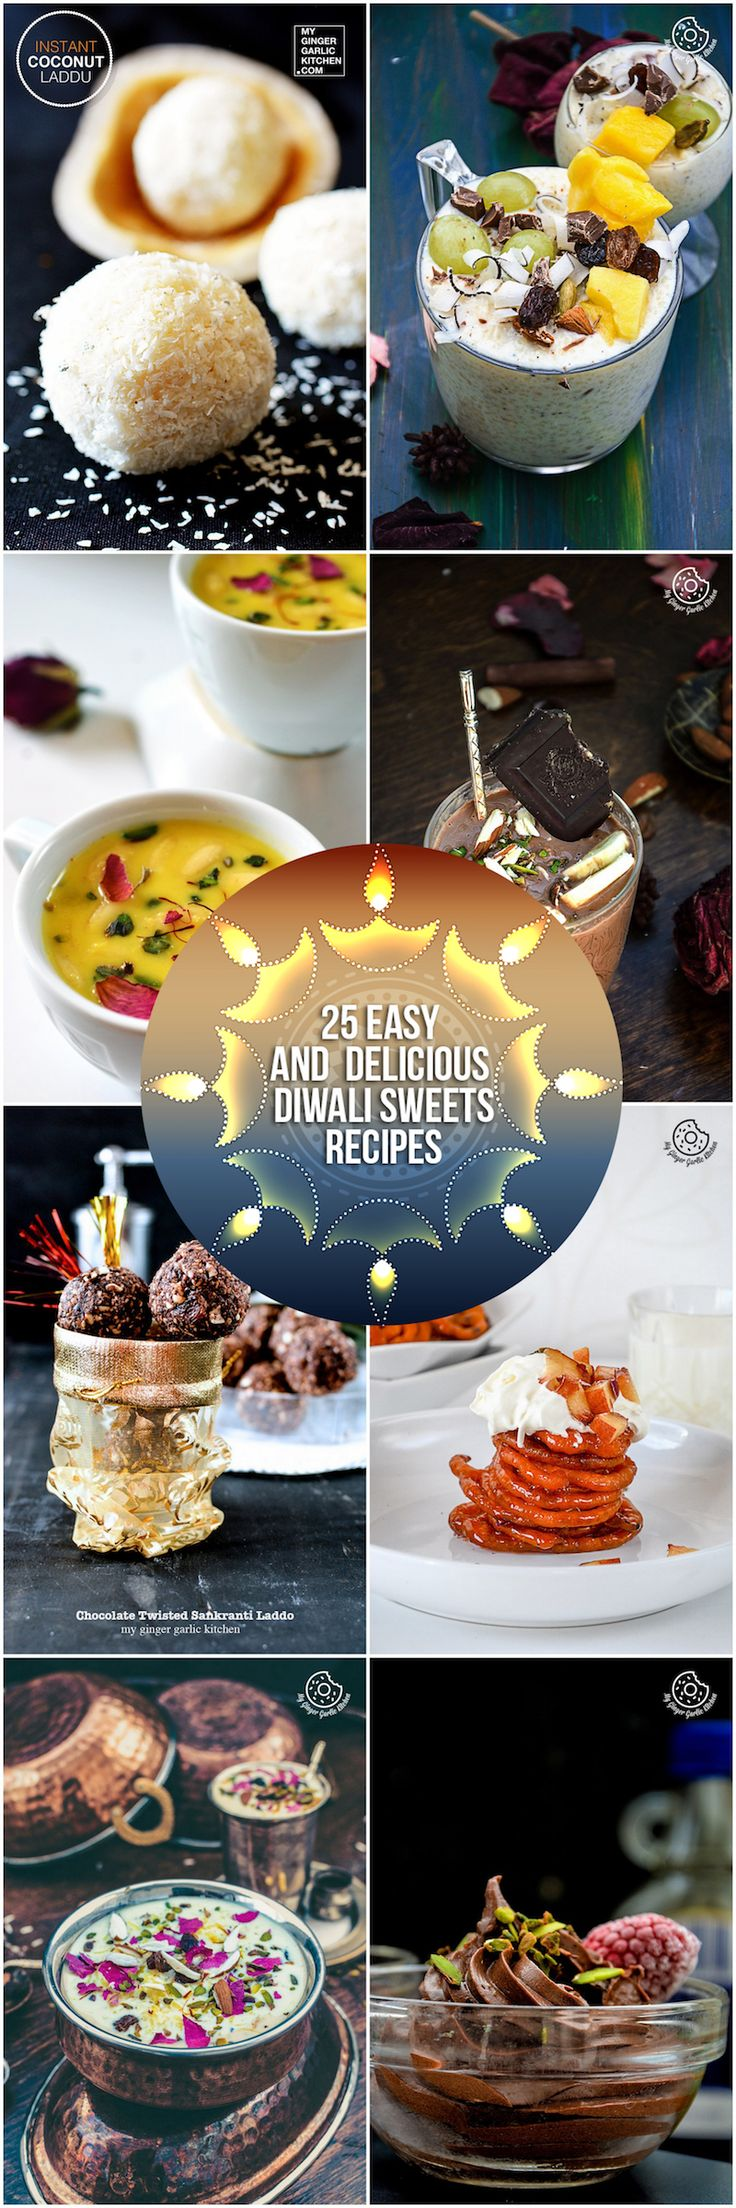 Easy diwali recipes south africa